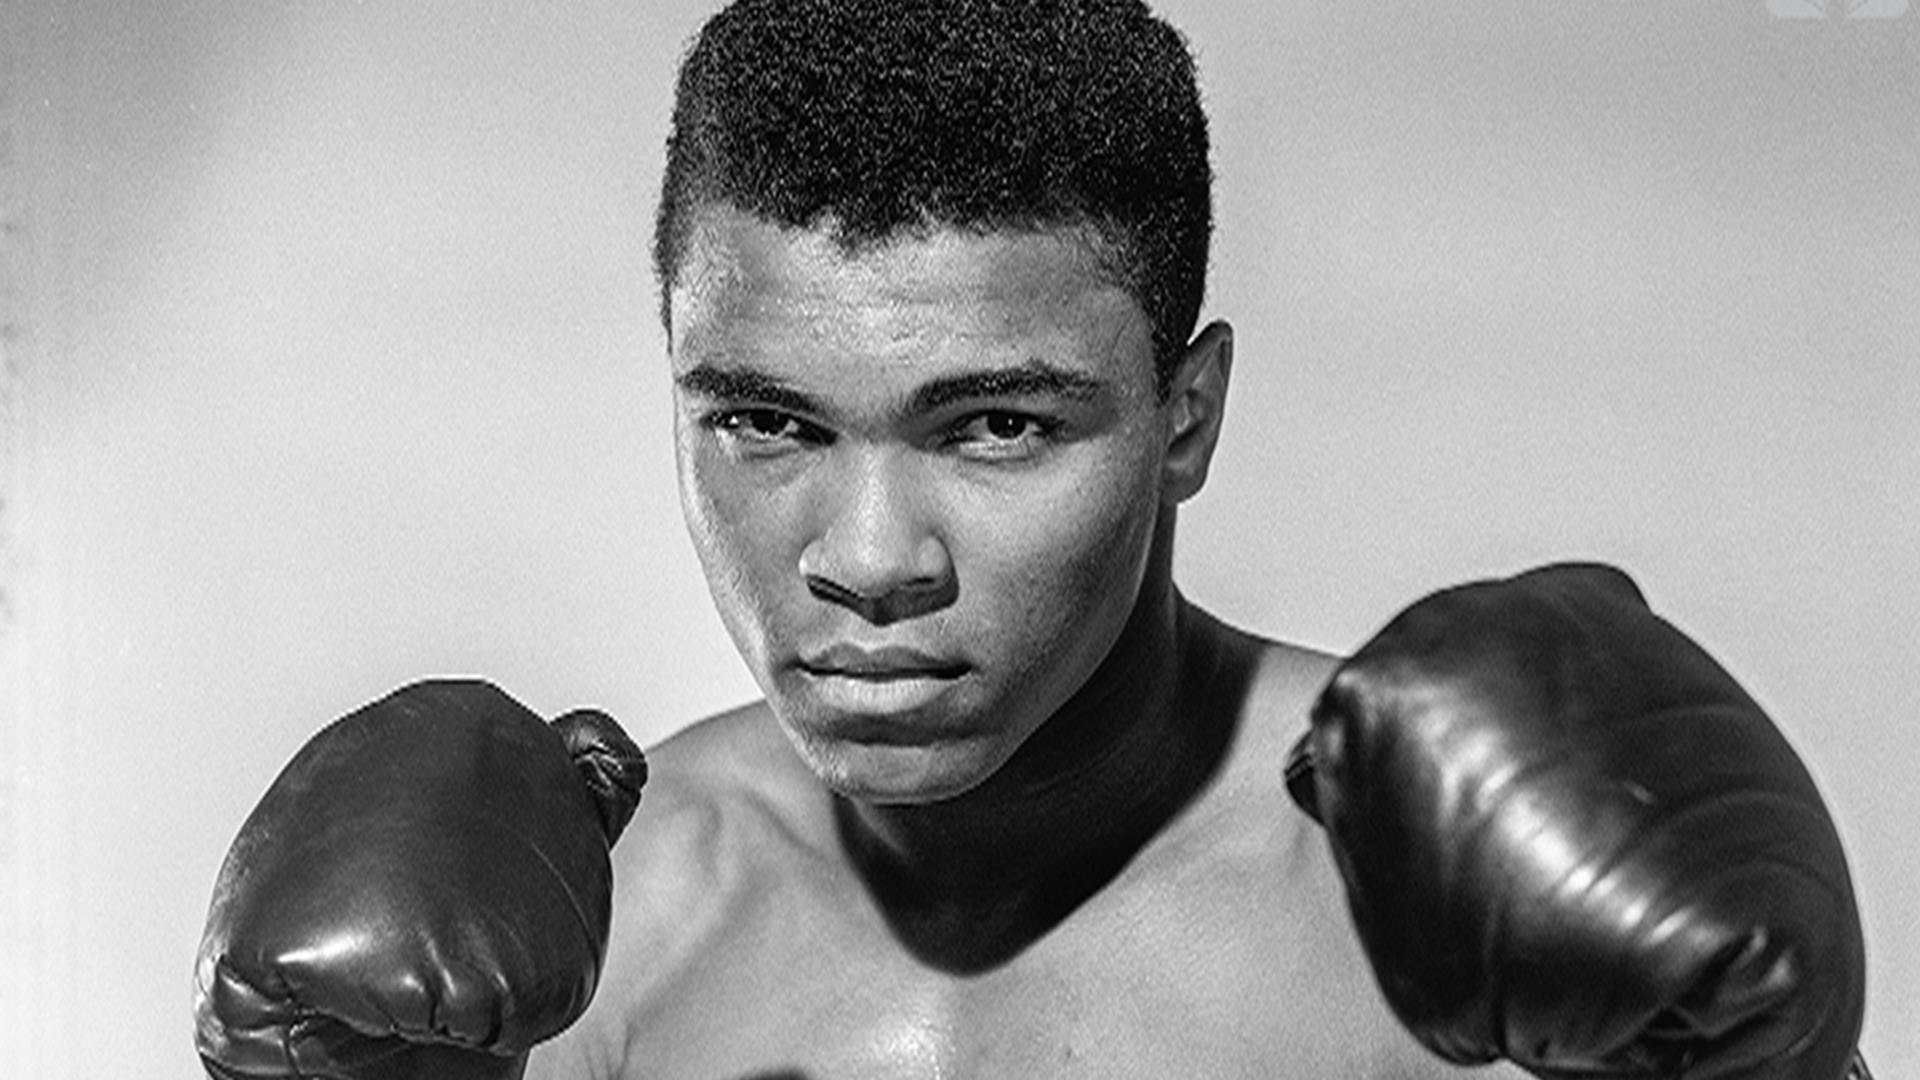 Gambar Mohammad Ali Muhammad Ali Wallpapers Hd Wallpaper Cave